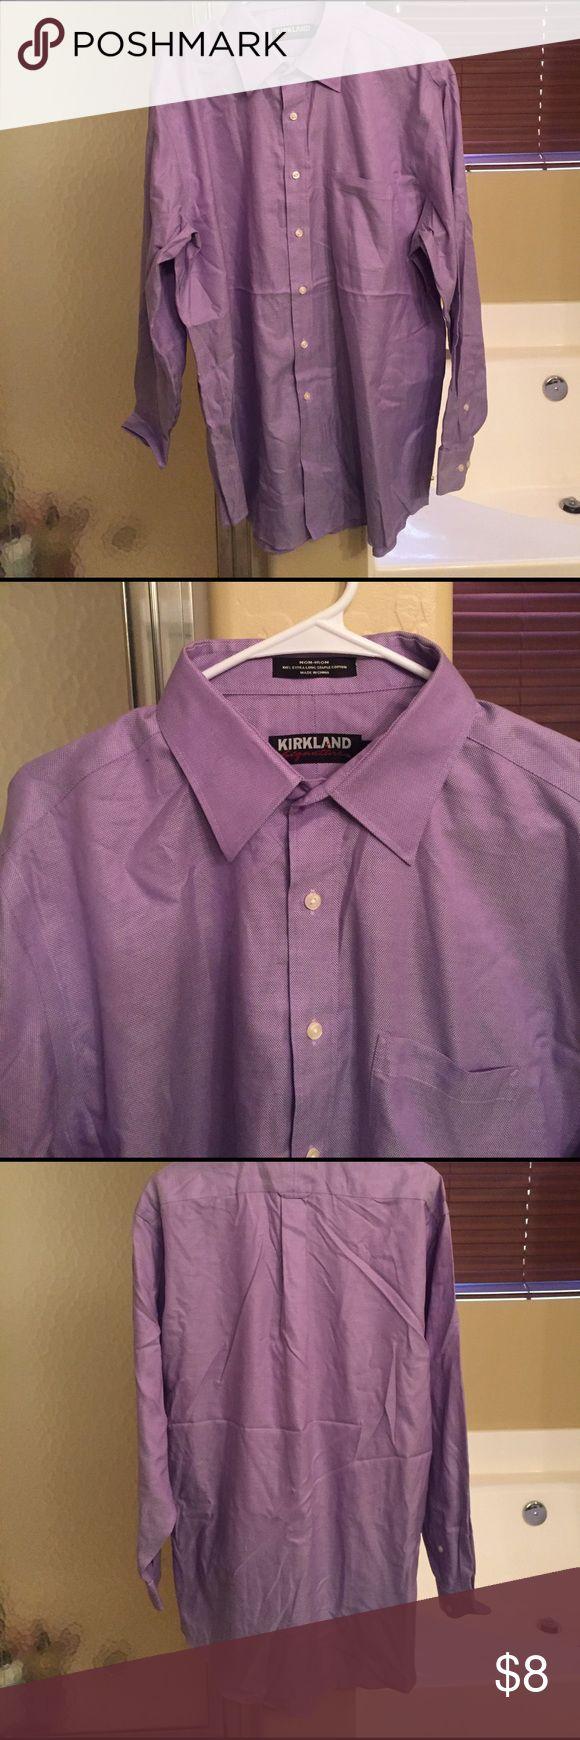 Mens Purple Dress Shirt Kirkland Signature  Size: 17/34 Non-Iron 100% Extra Long Staple Cotton  #8 Kirkland Signature Shirts Dress Shirts